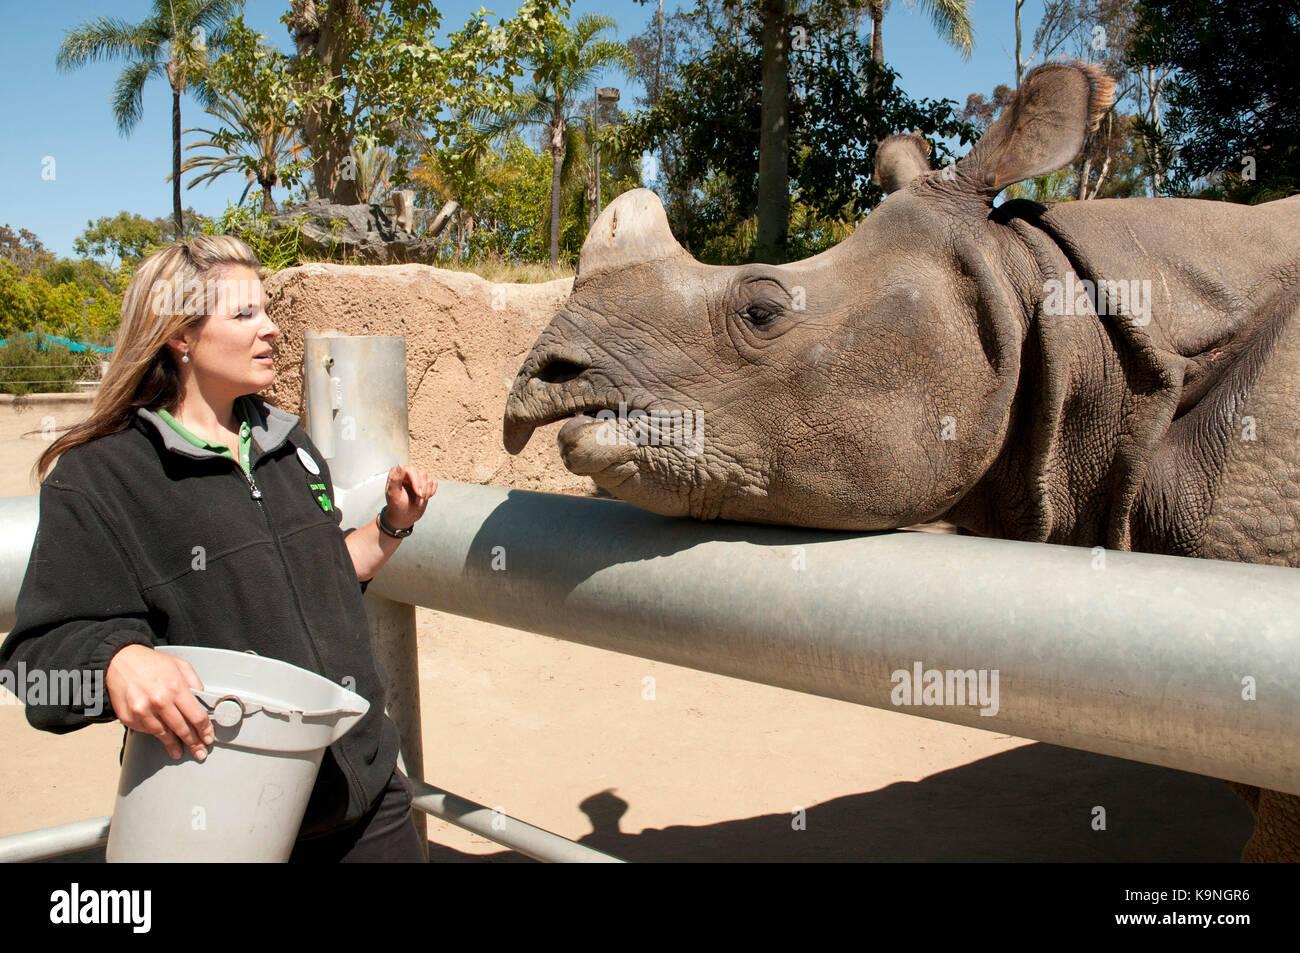 Zoo keeper feeding a rhinoceros at San Diego Zoo, Balboa Park, California, USA - Stock Image